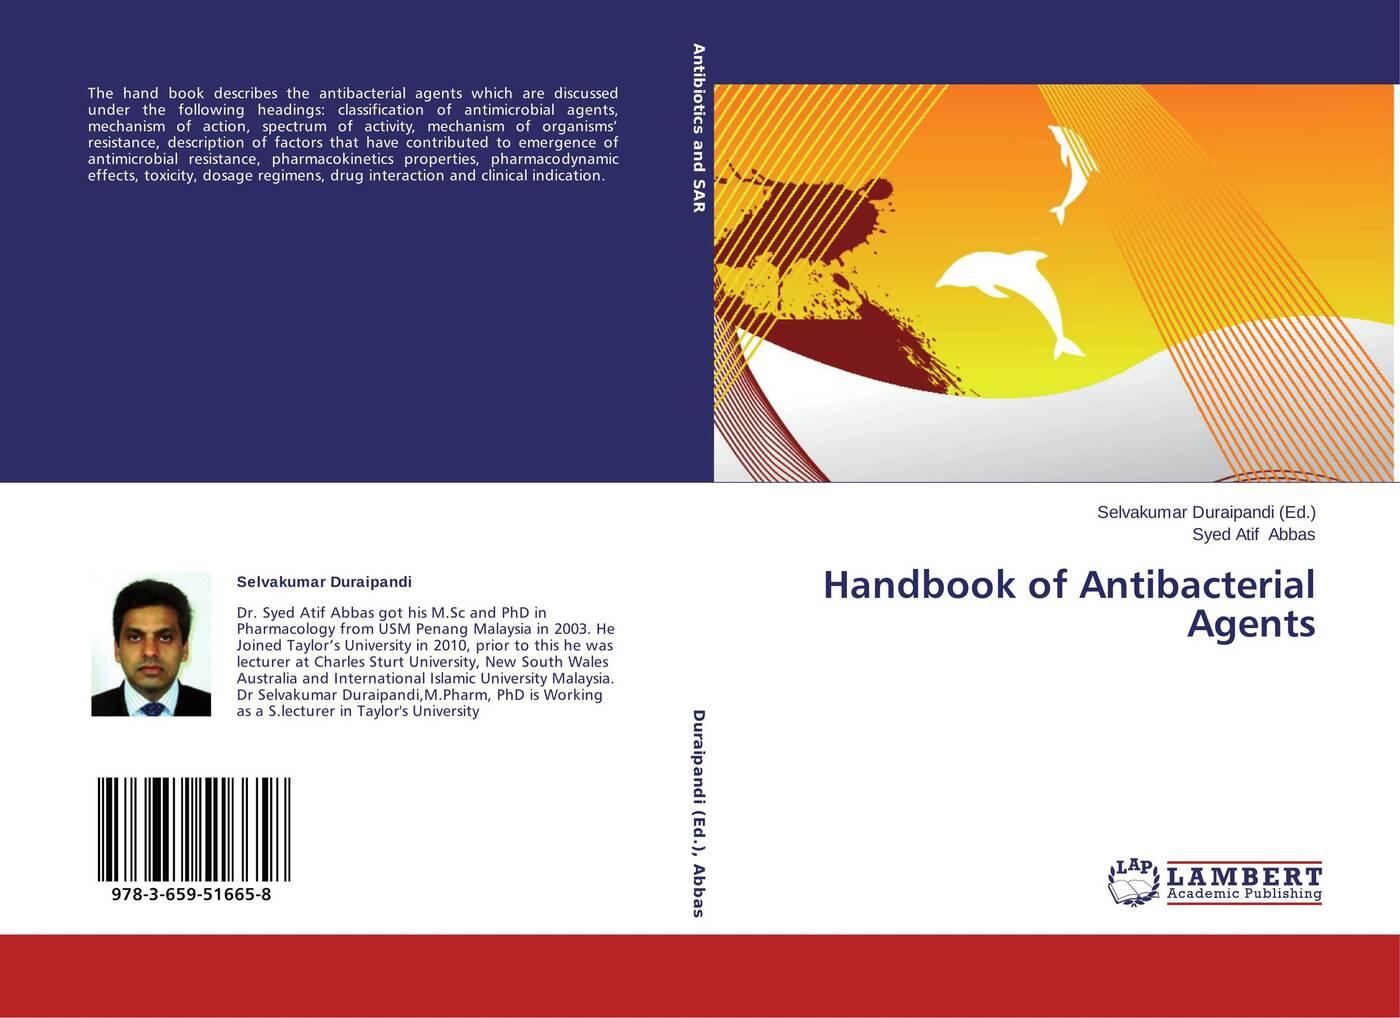 Selvakumar Duraipandi and Syed Atif Abbas Handbook of Antibacterial Agents handbook of antibacterial agents